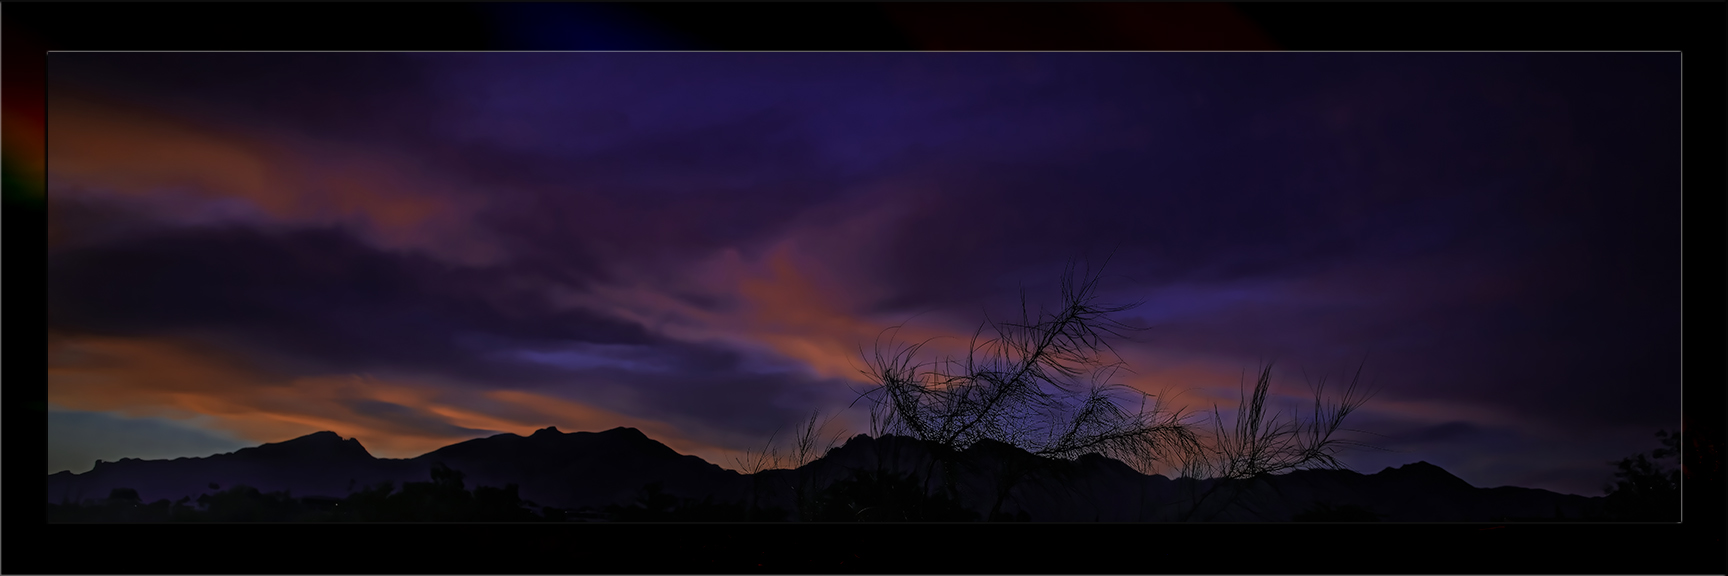 Sunset June 2, 2012 49 (1)-Edit-4-72-2